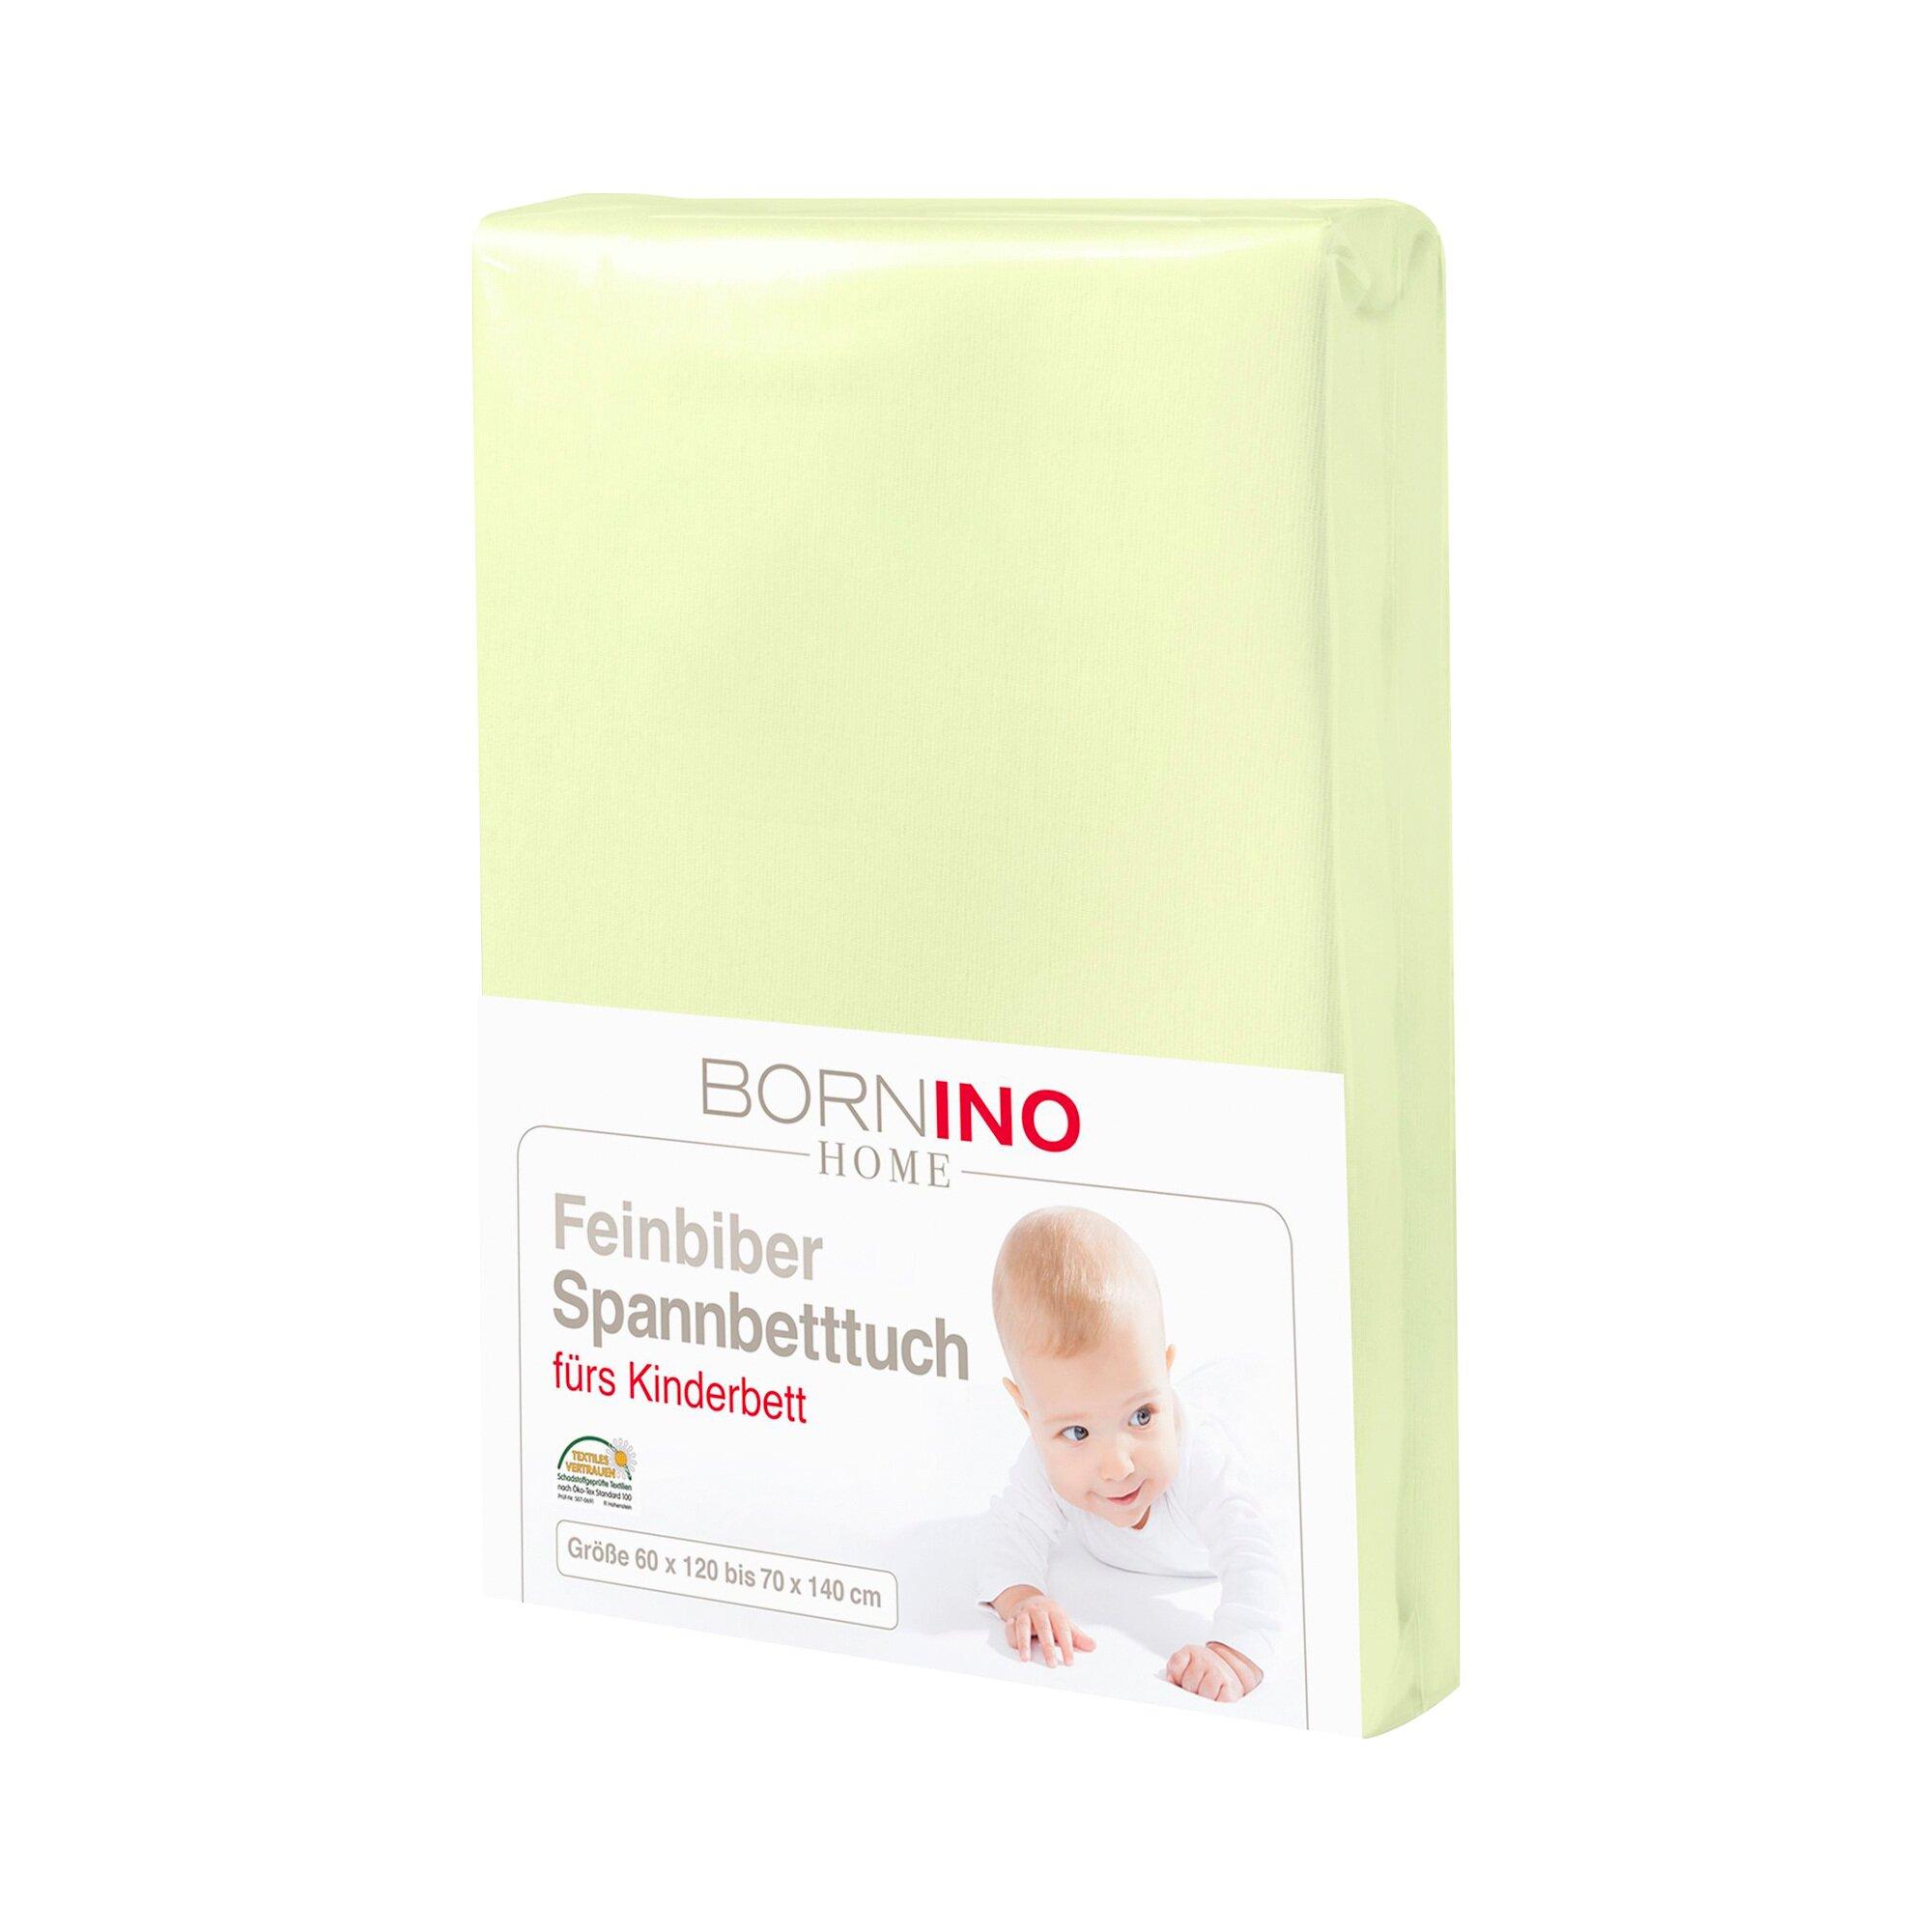 Bornino Home Feinbiber-Spannbetttuch 60x120 cm - 70x140 cm gruen 70